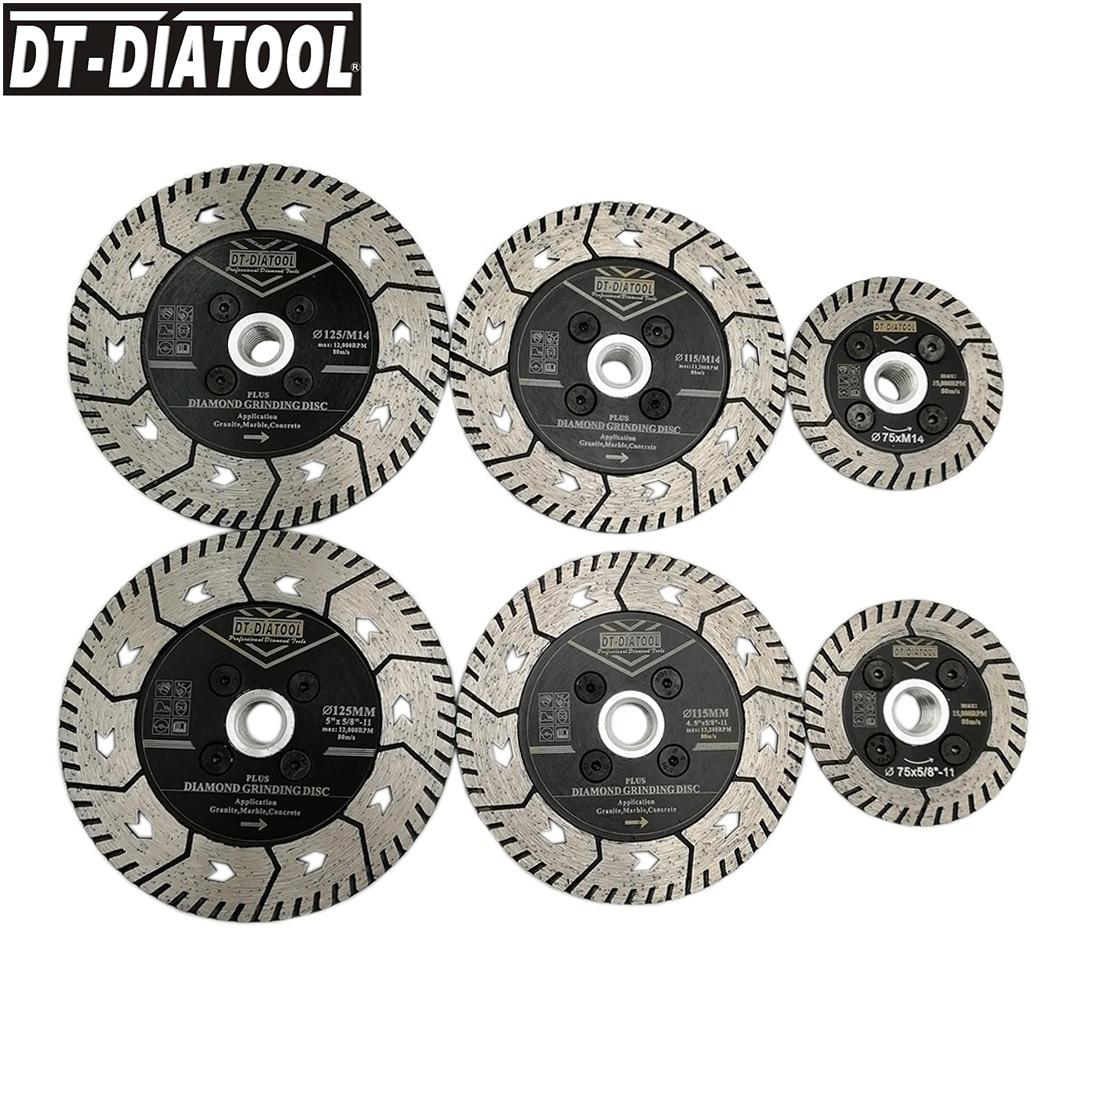 DT-DIATOOL 1pc Diameter 75/115/125mm Diamond Dual Cutting Wheel Saw Blades Grinding Disc For Grind Sharpen Granite Marble Concrete M14 Or 5/8-11 Thread